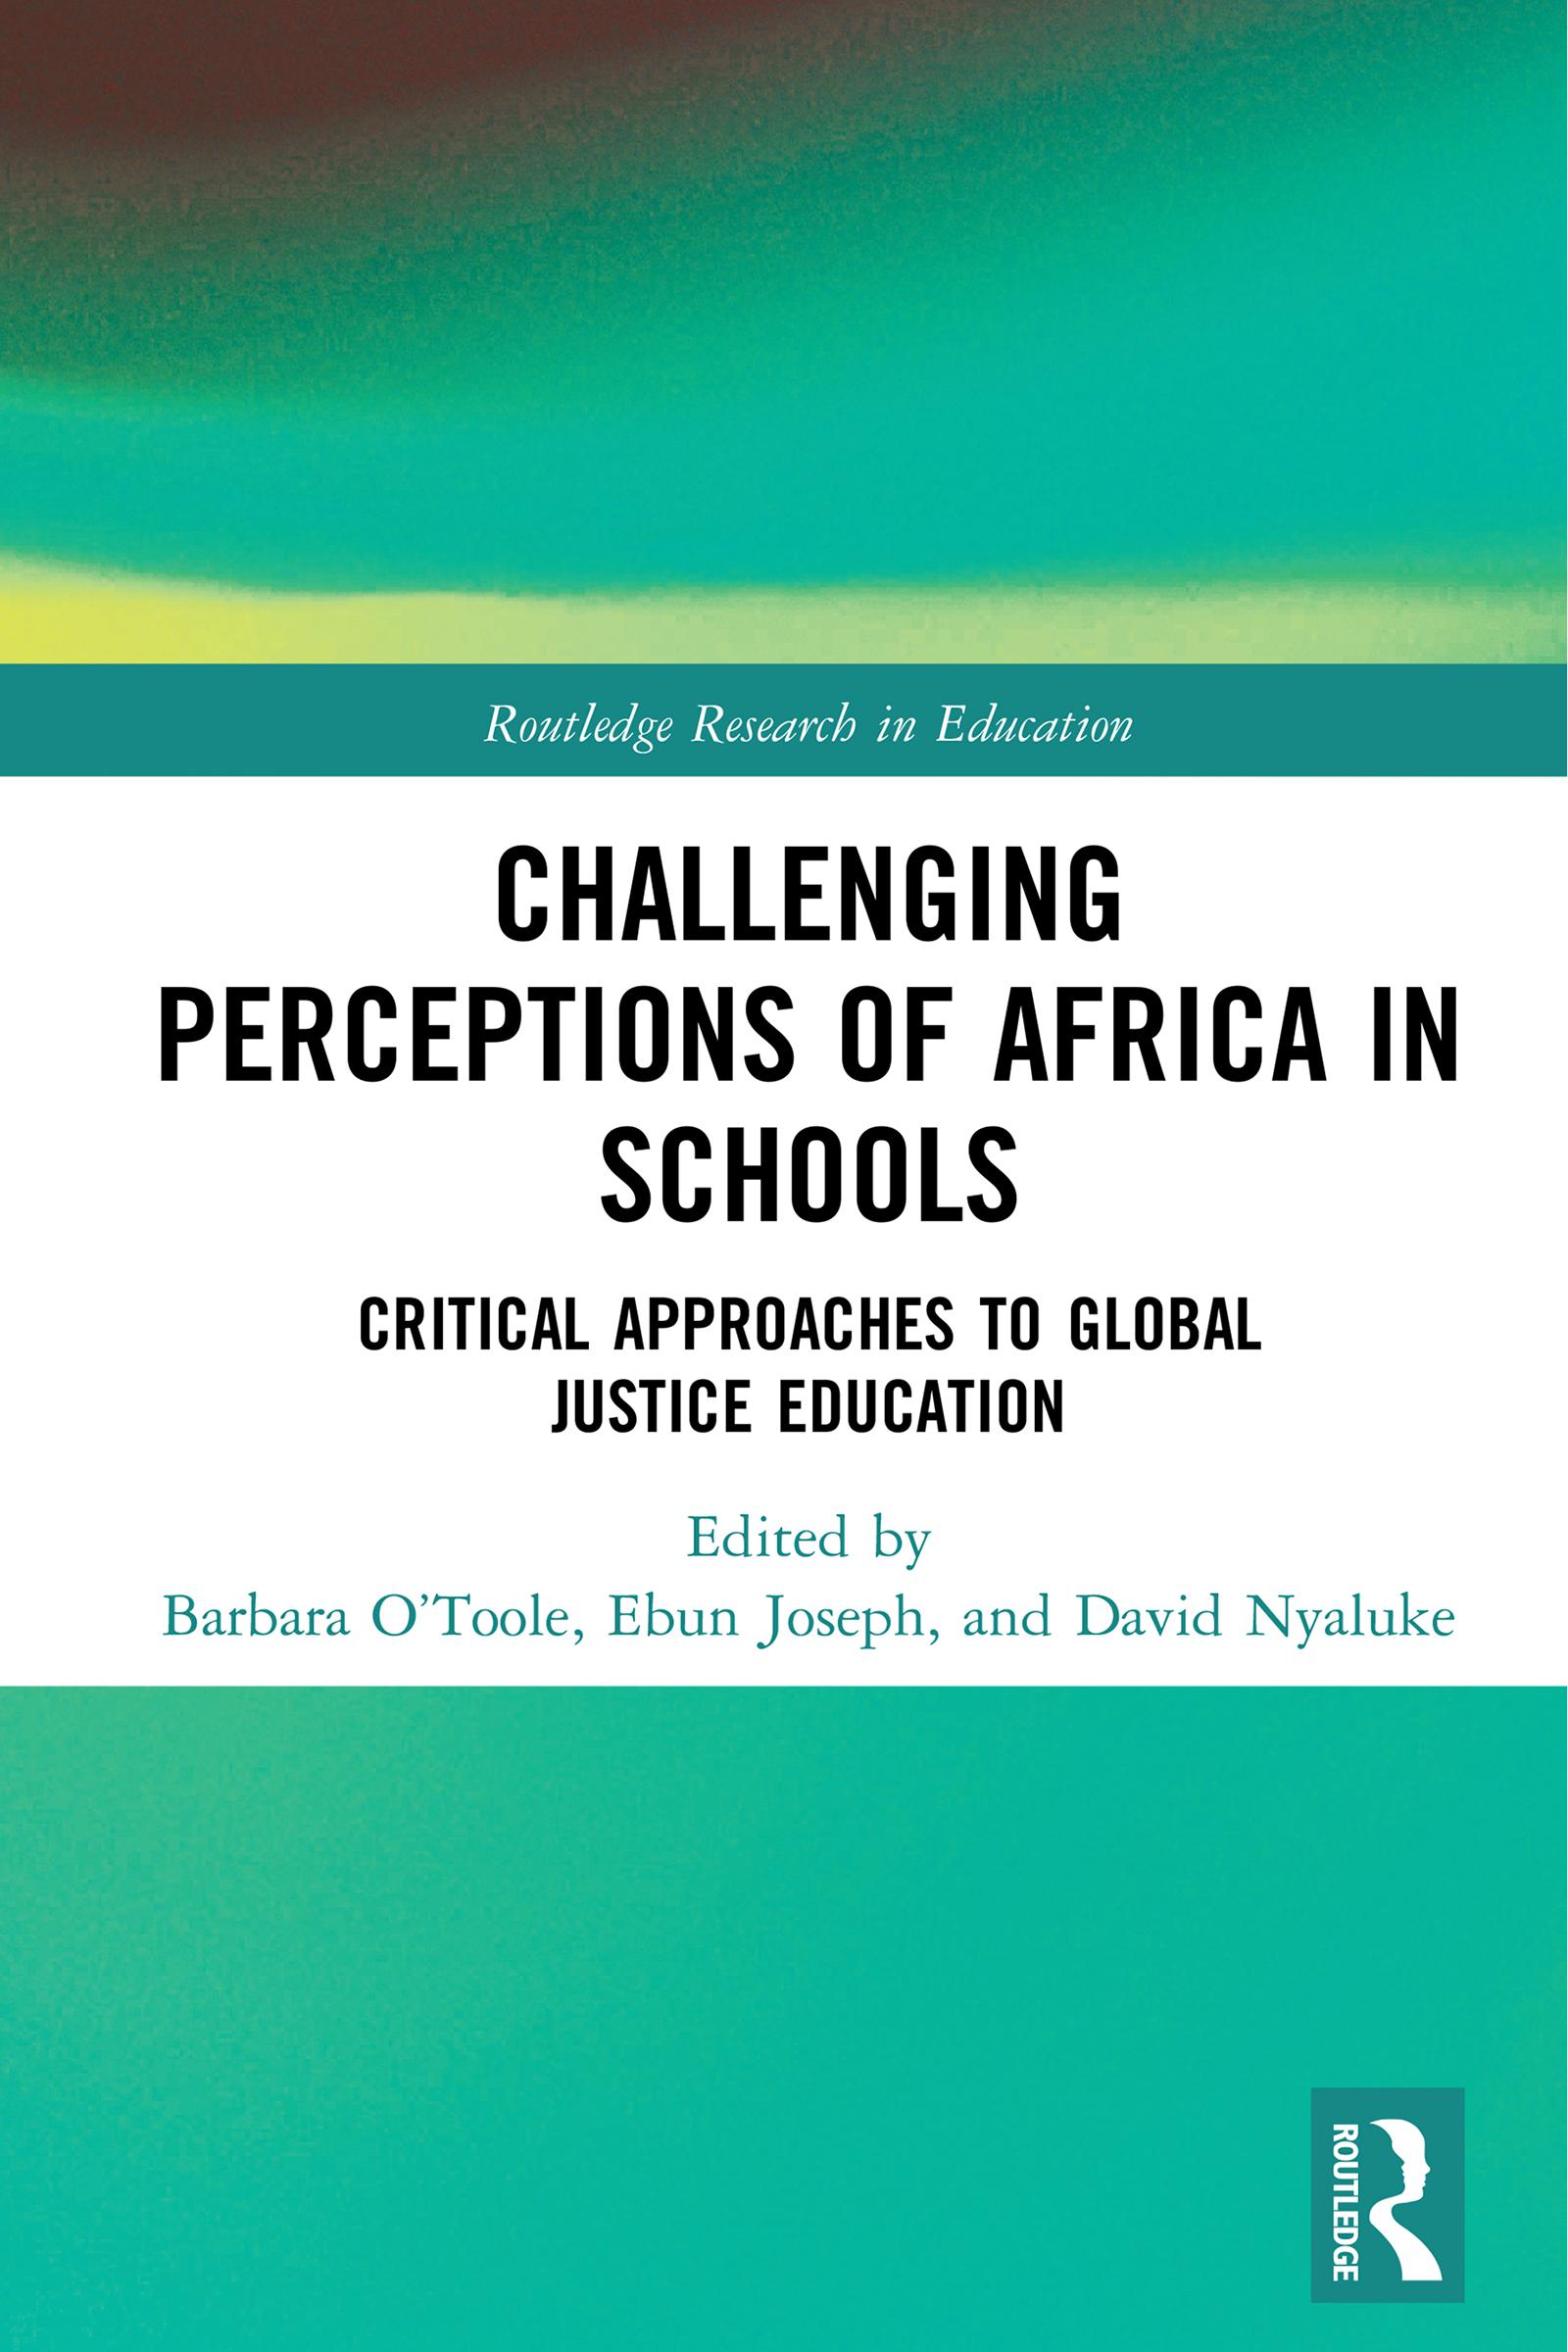 Challenging Perceptions of Africa in Schools